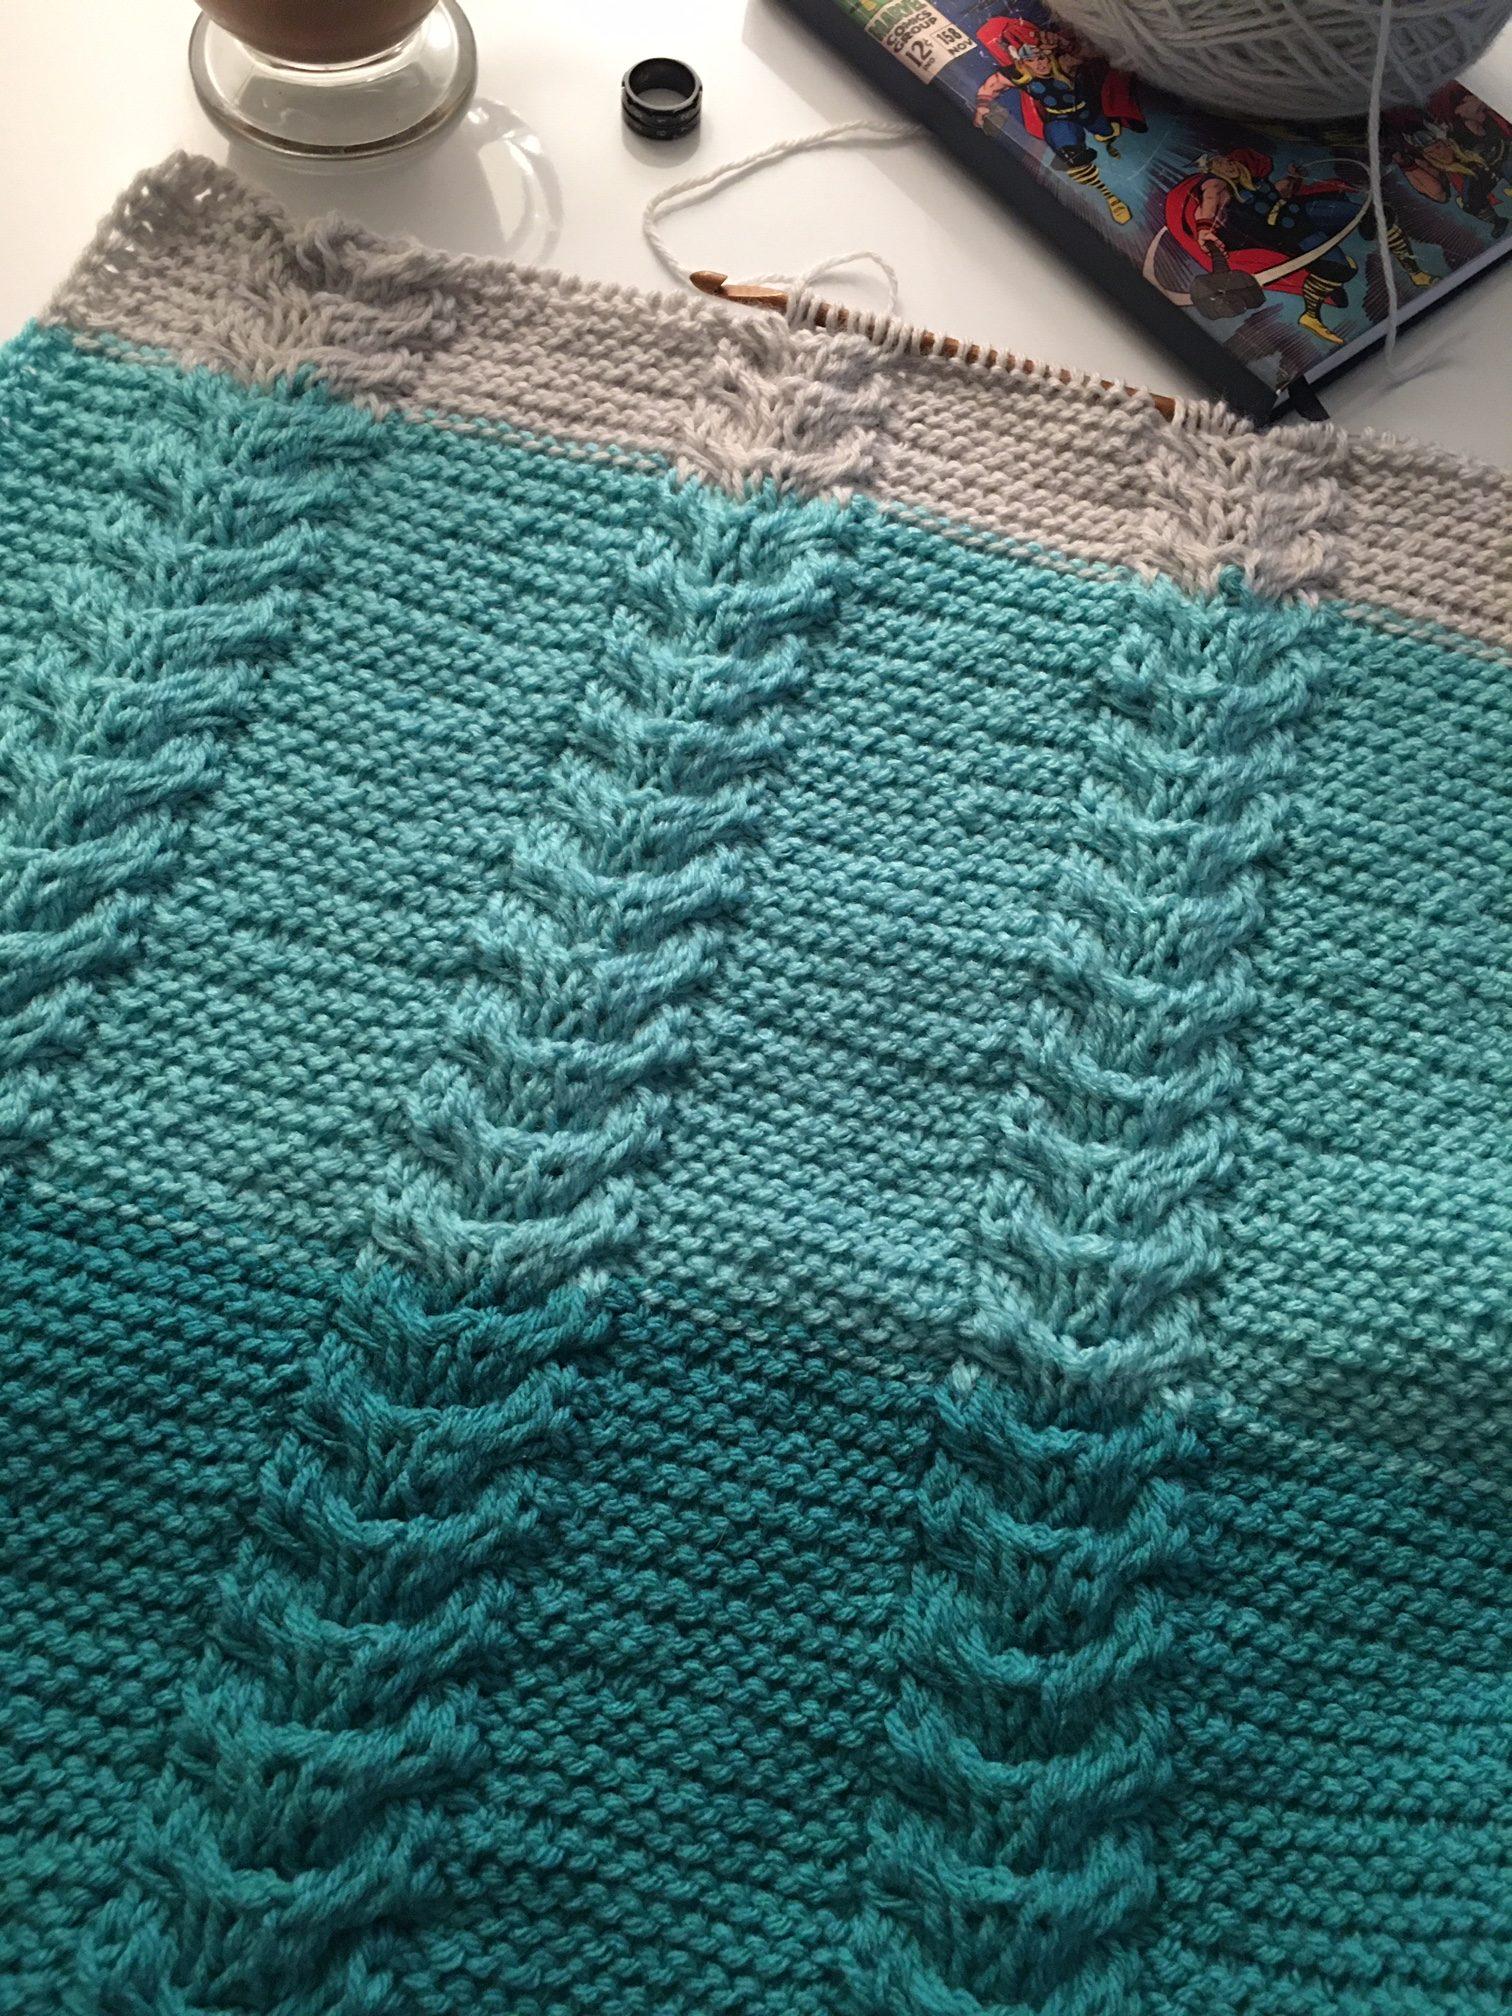 Ofilia S Blanket Tunisian Crochet Mode Bespoke